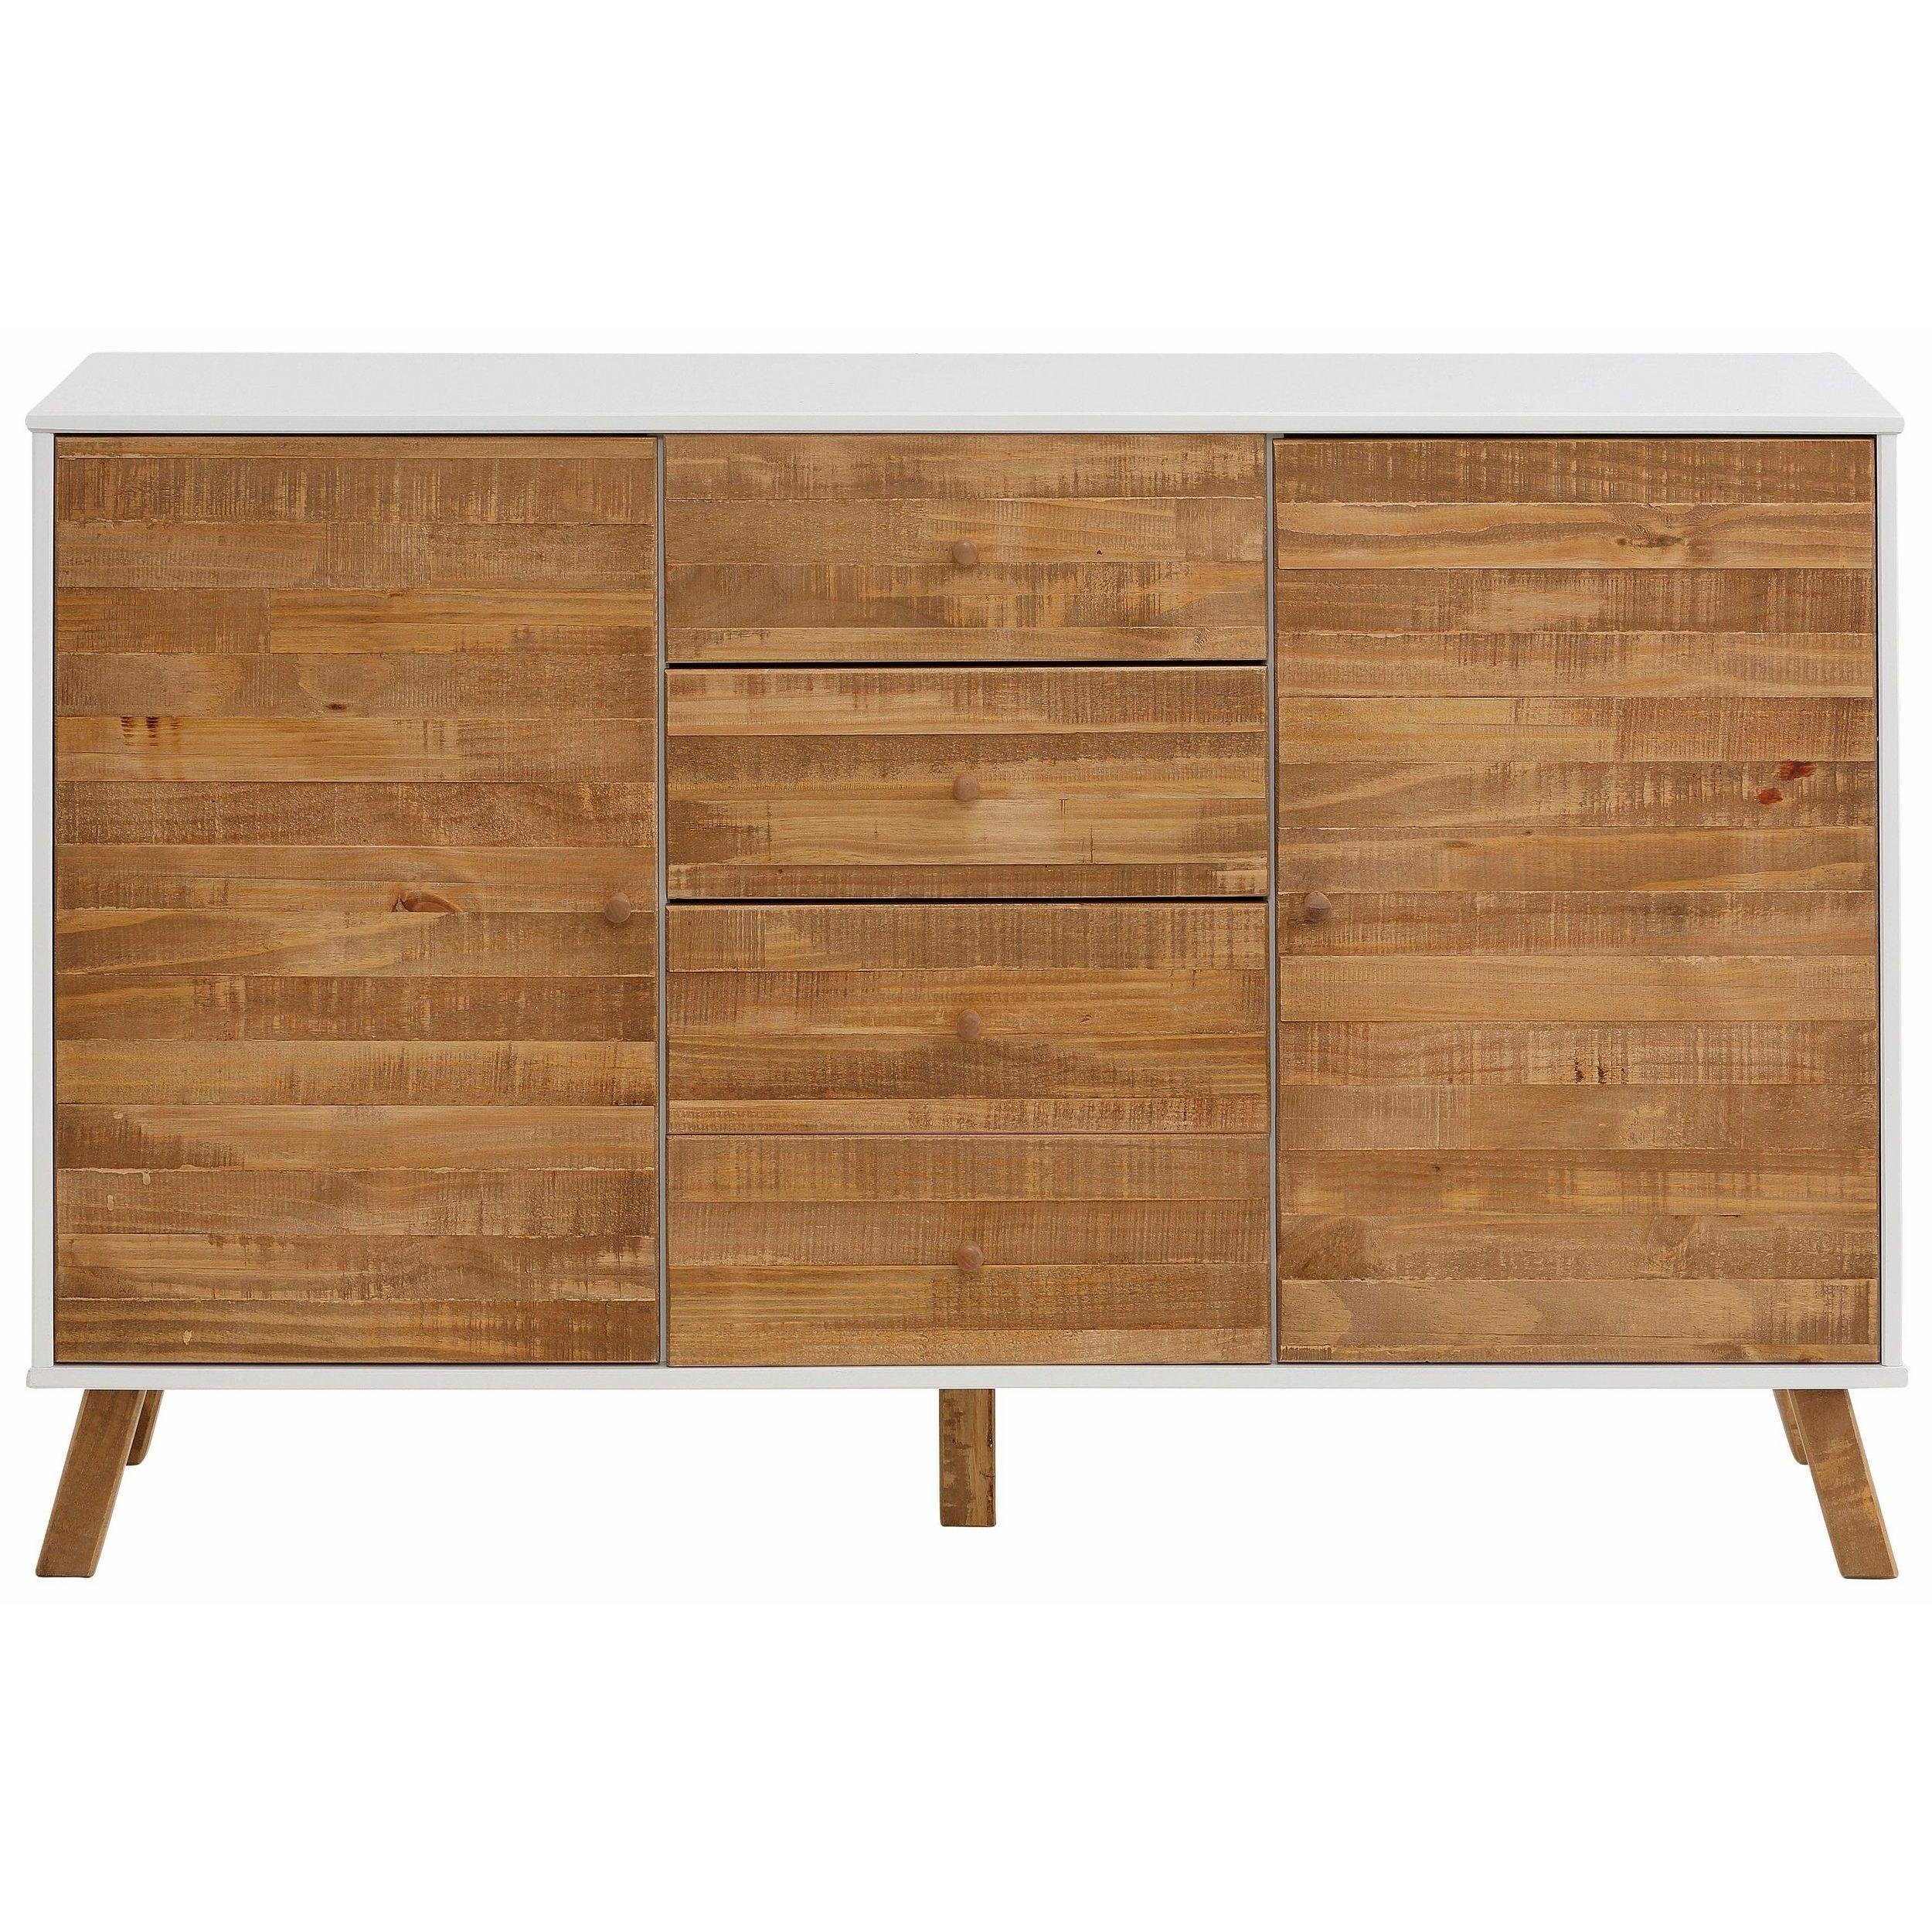 Shop Rafael 2 Door 4 Drawer Sideboard, Solid Pine, Off White pertaining to Burn Tan Finish 2-Door Sideboards (Image 24 of 30)